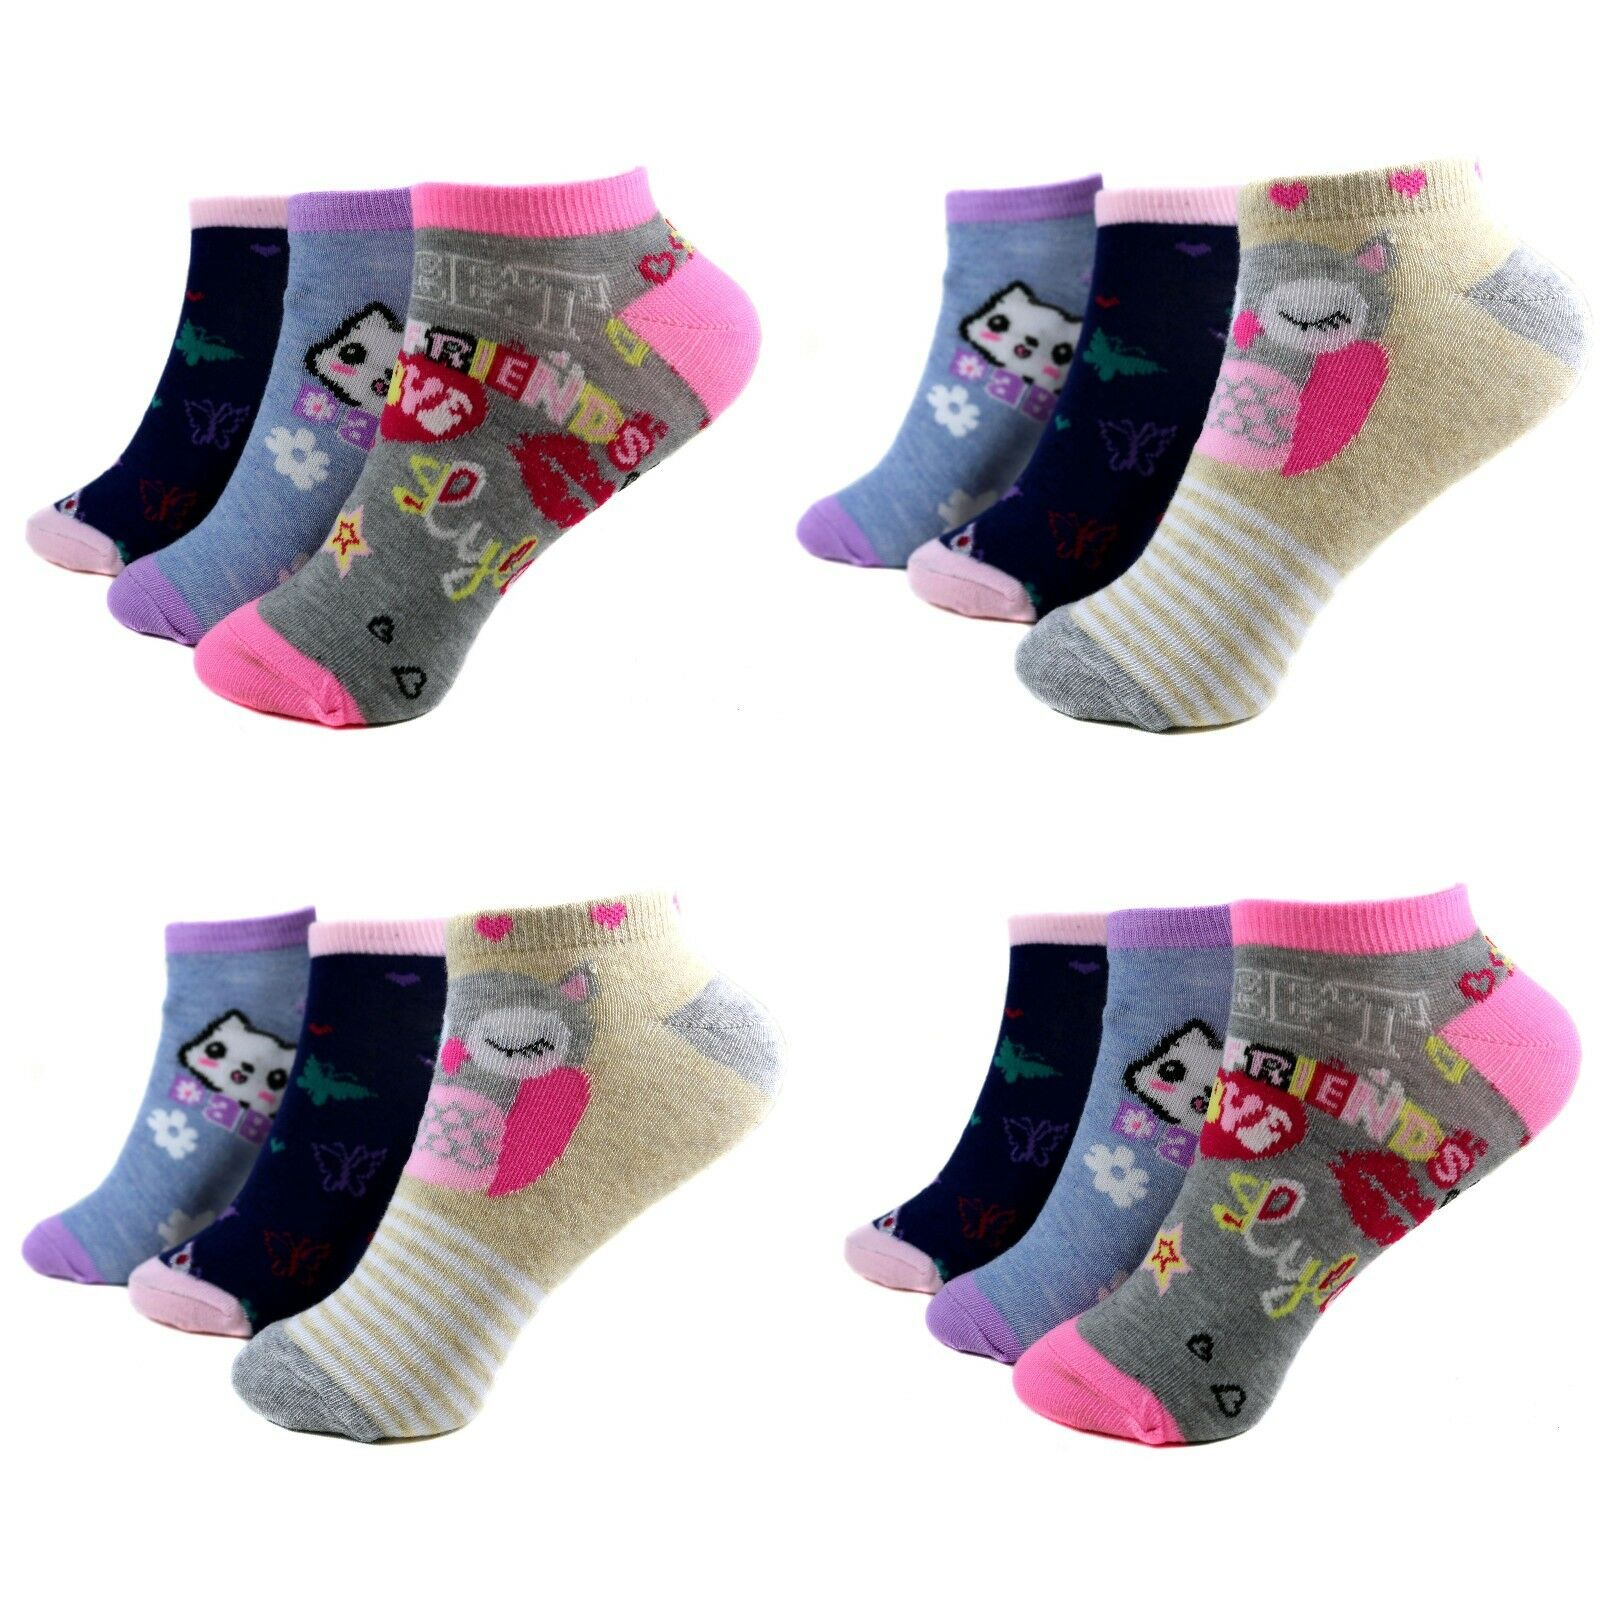 12 Paar Kids Mädchen Socken Kinder Sneaker Strümpfe 95% Baumwolle Gr.23-38 C-217